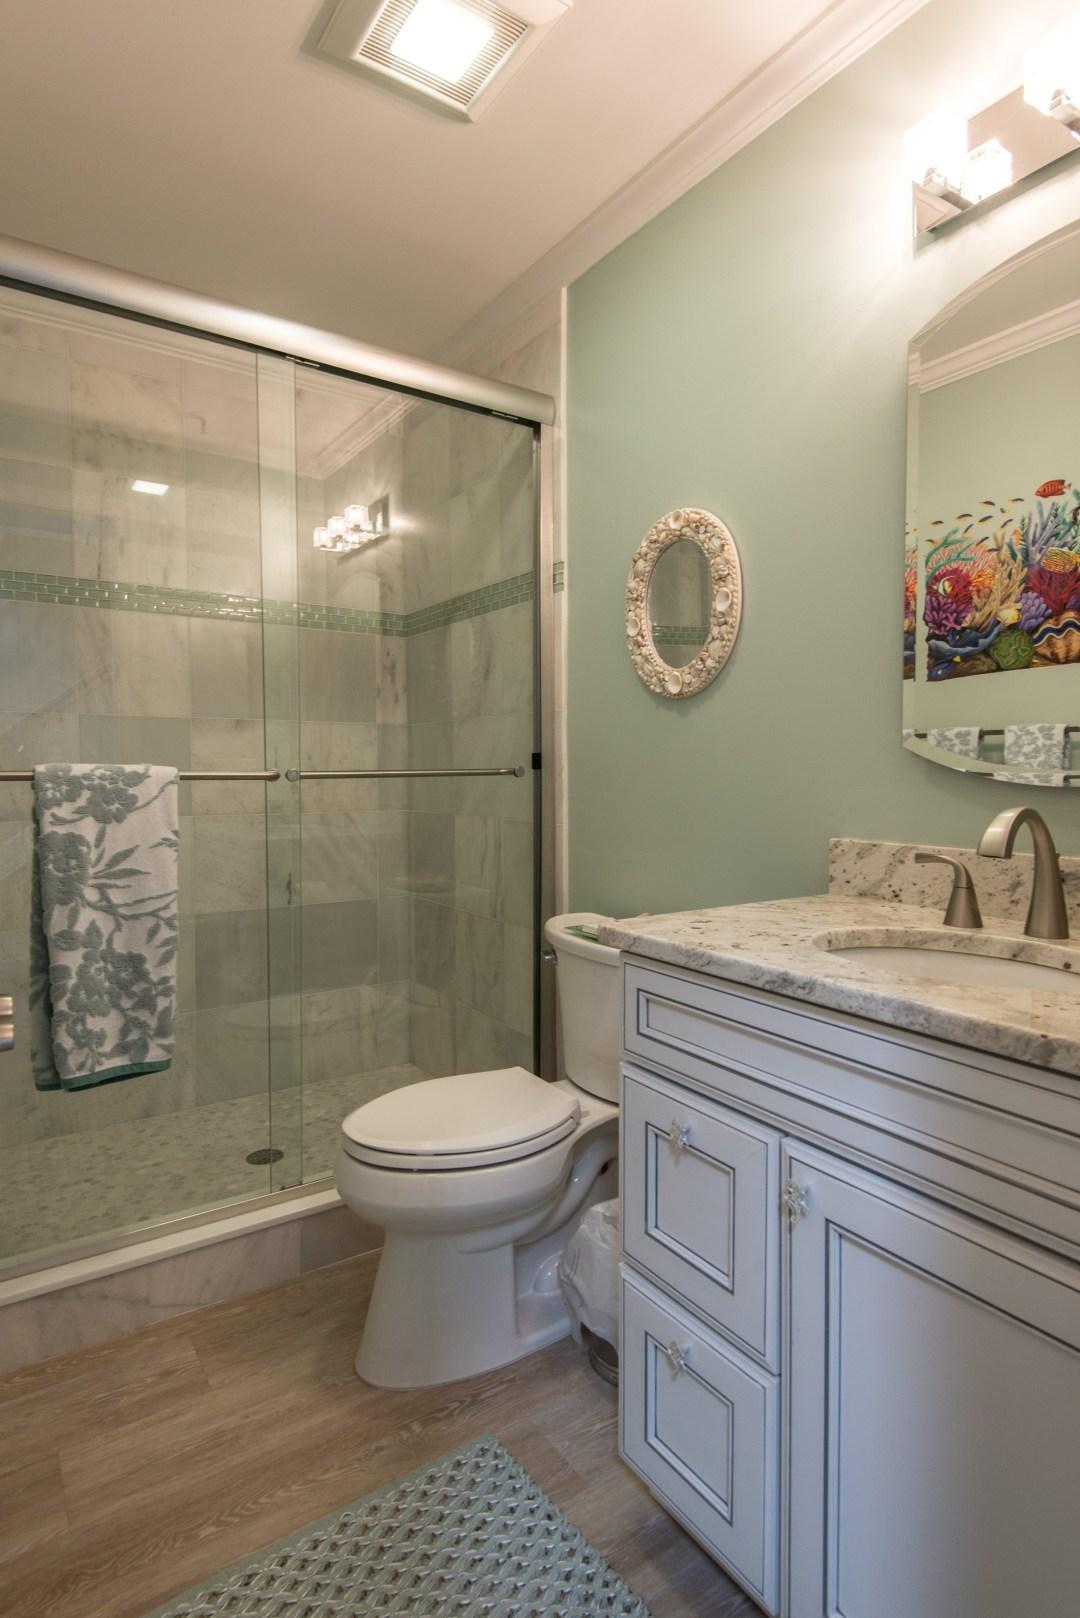 Bathroom Remodel in Kings Grant, Fenwick Island DE with Sliding Glass Shower Doors, Wood Flooring and White Vanity